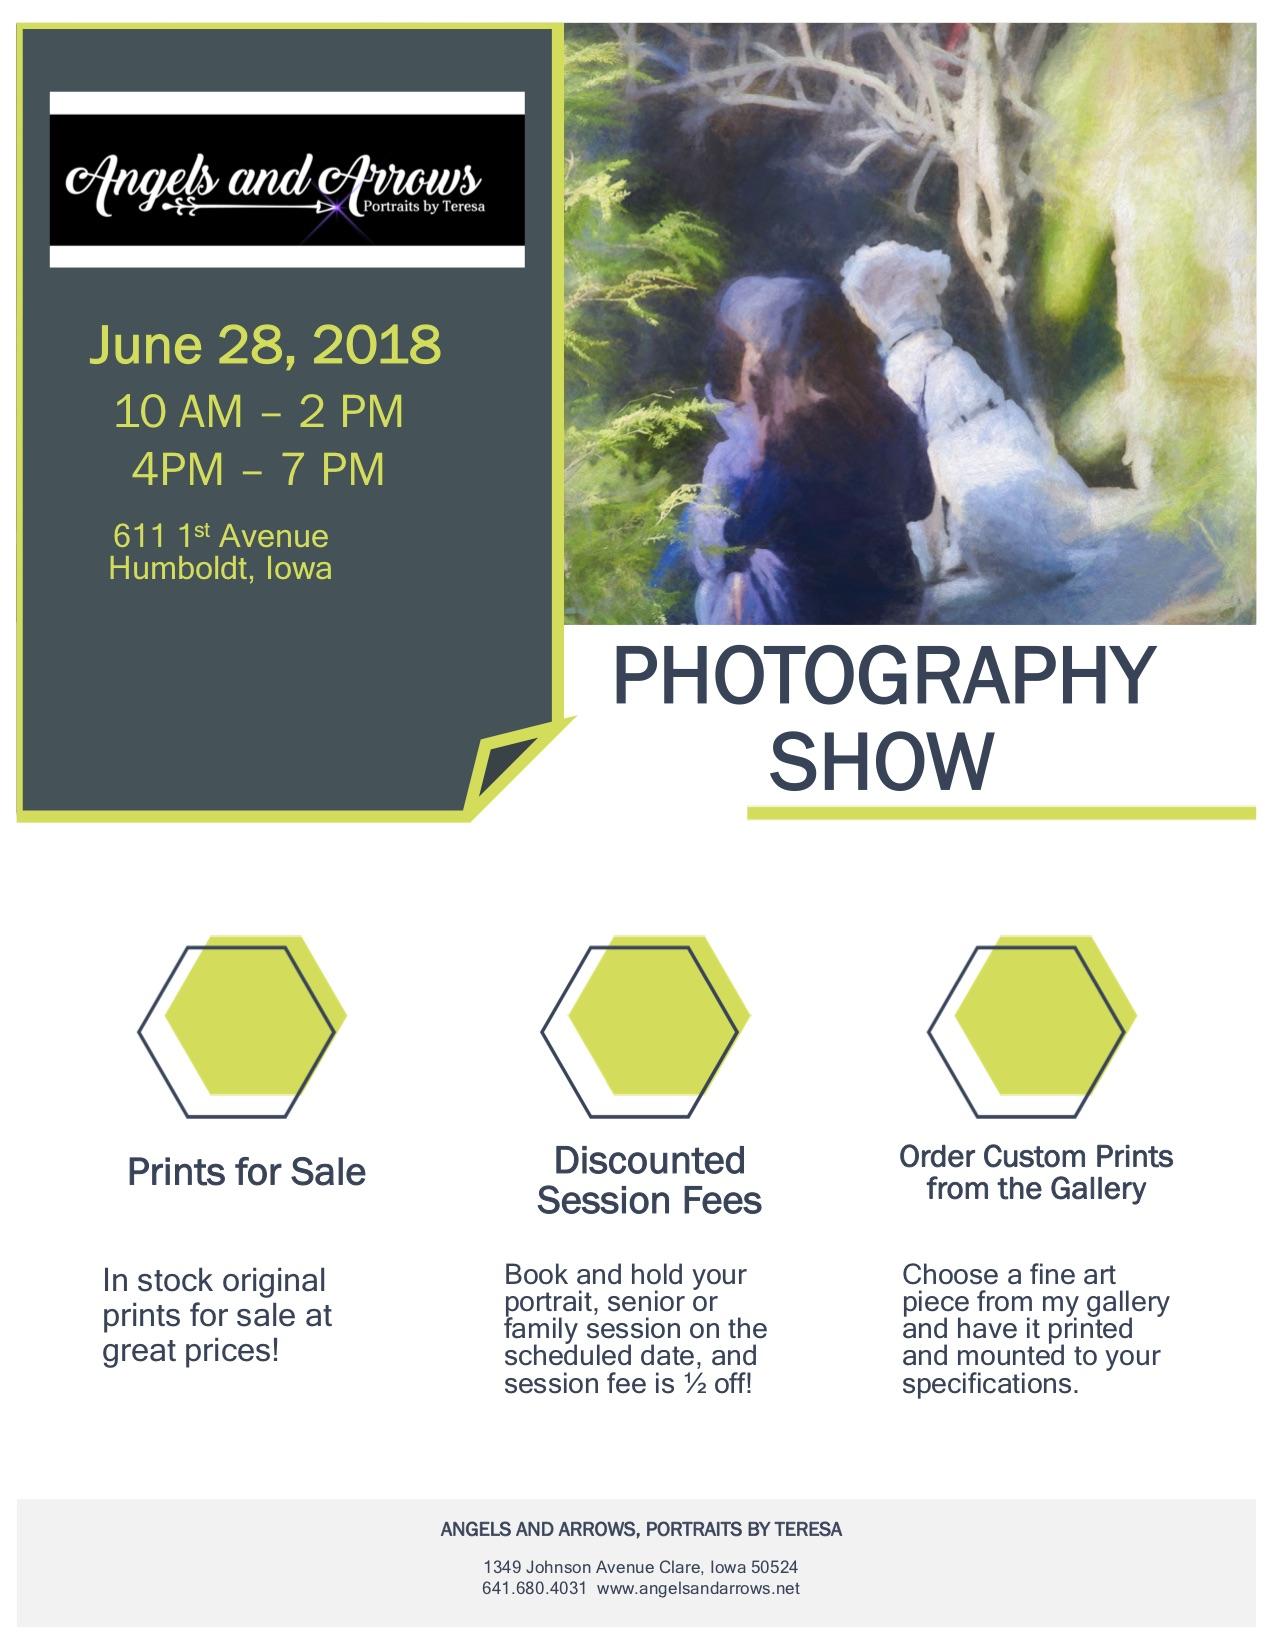 Photography Show/Sale in Humboldt | Photographer | Ottumwa | Angels